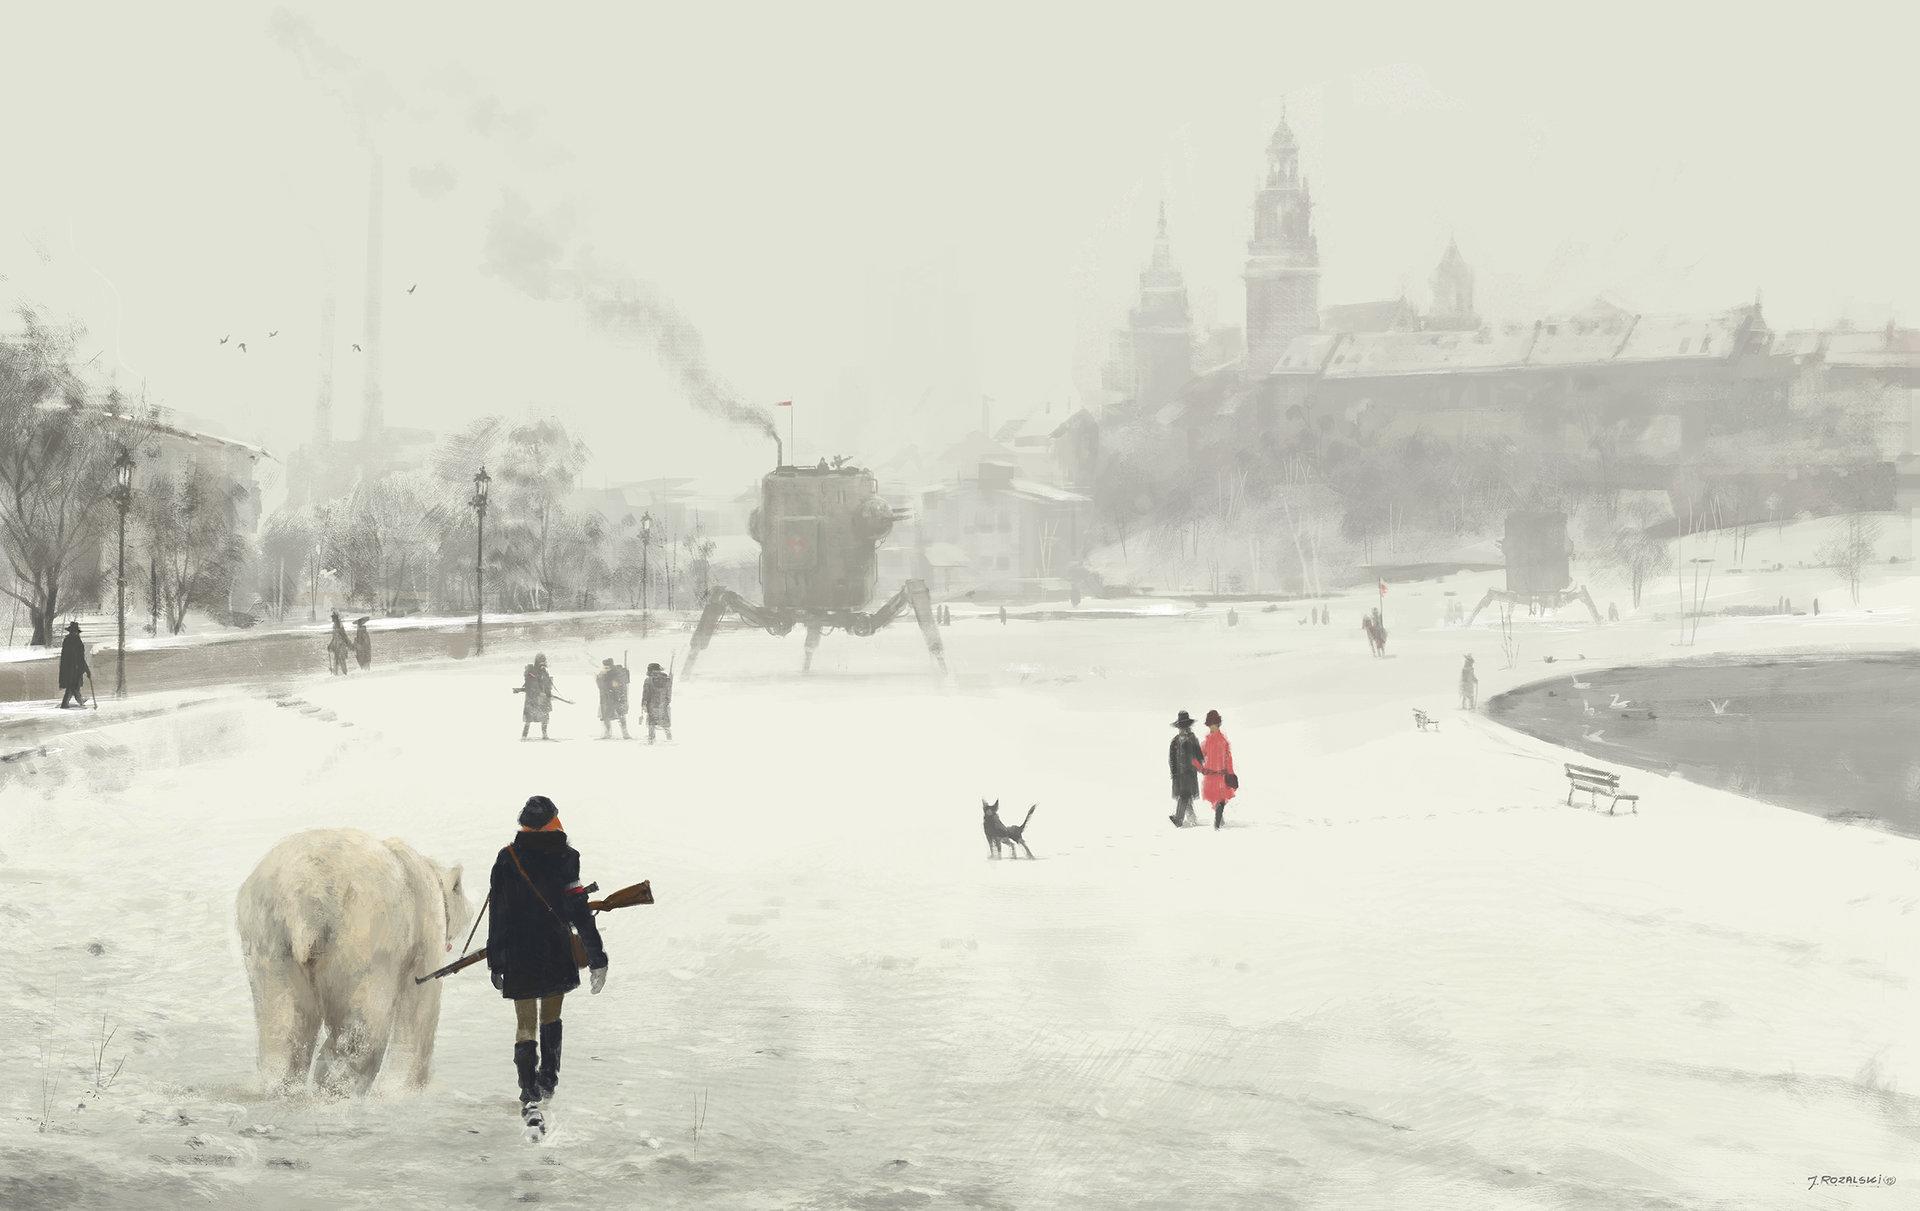 Jakub rozalski 1920 krakow art1